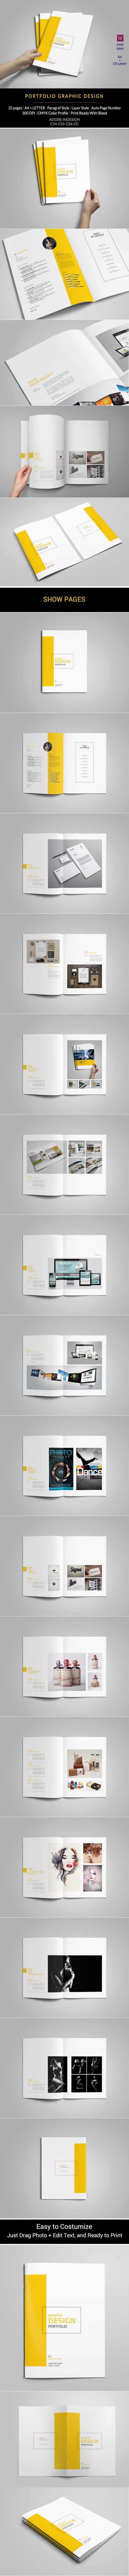 https://www.behance.net/gallery/26689171/Graphic-Design-Portfolio-Template                                                                                                                                                                                 More